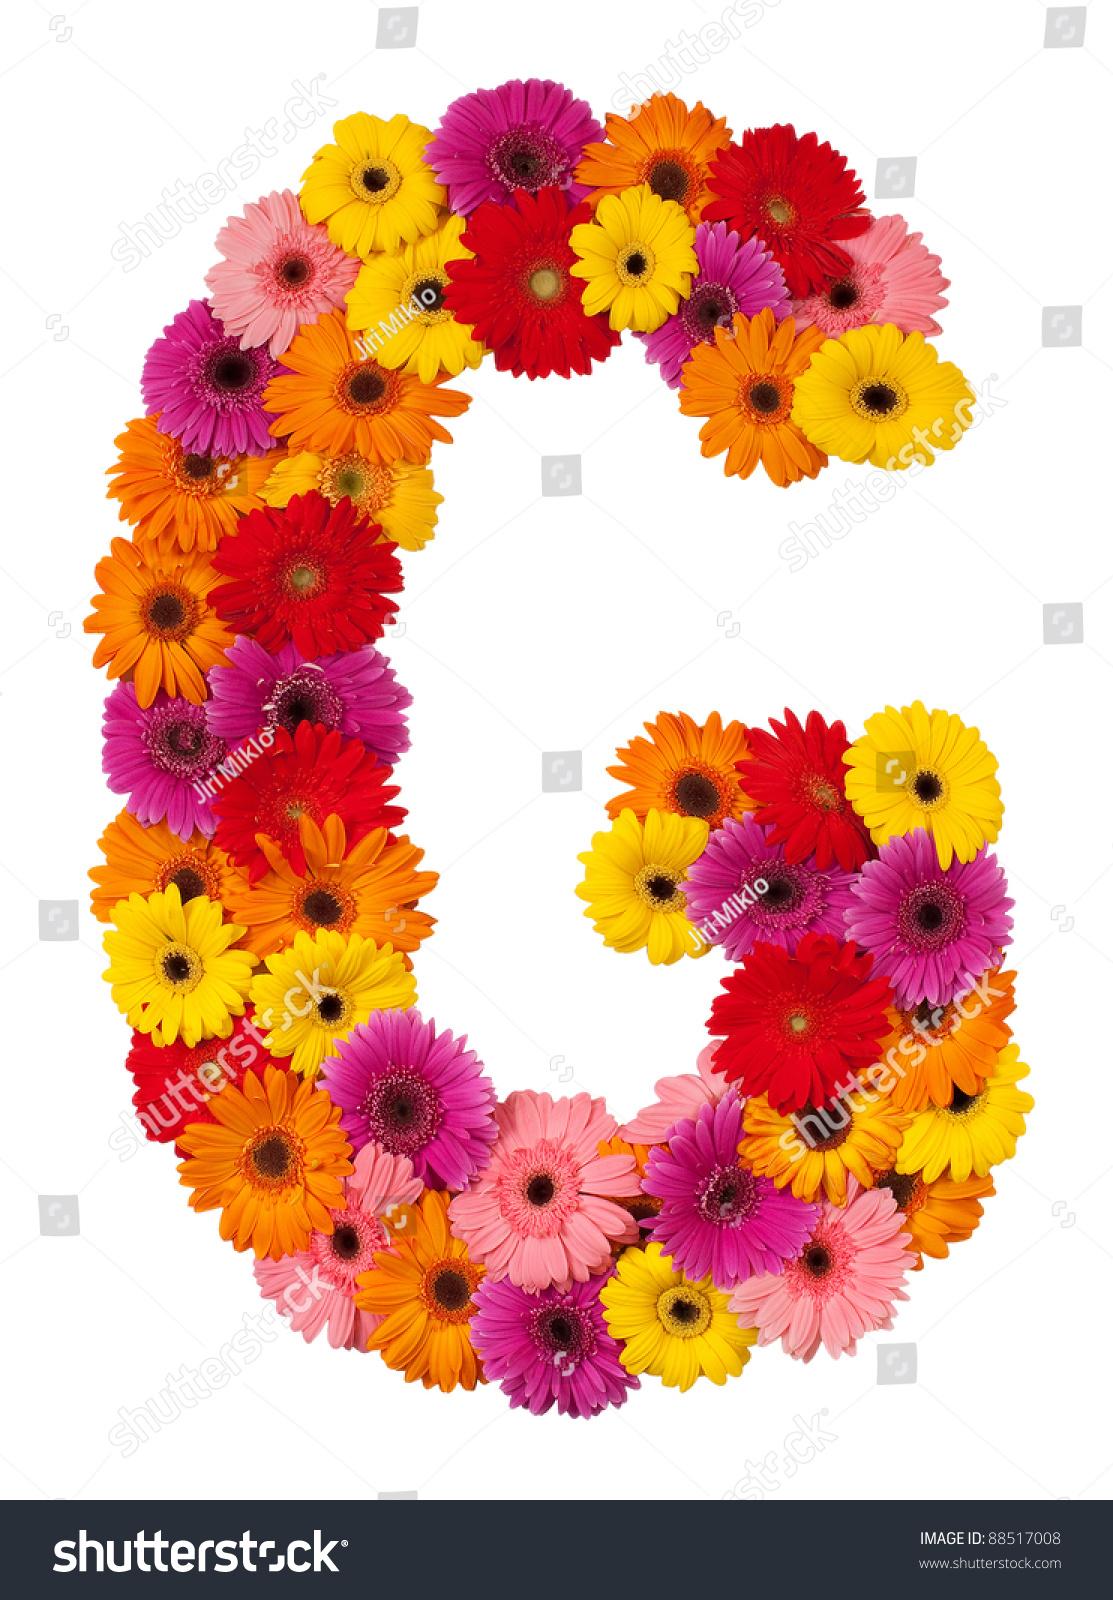 Background image 8851 - Letter G Flower Alphabet Isolated On White Background